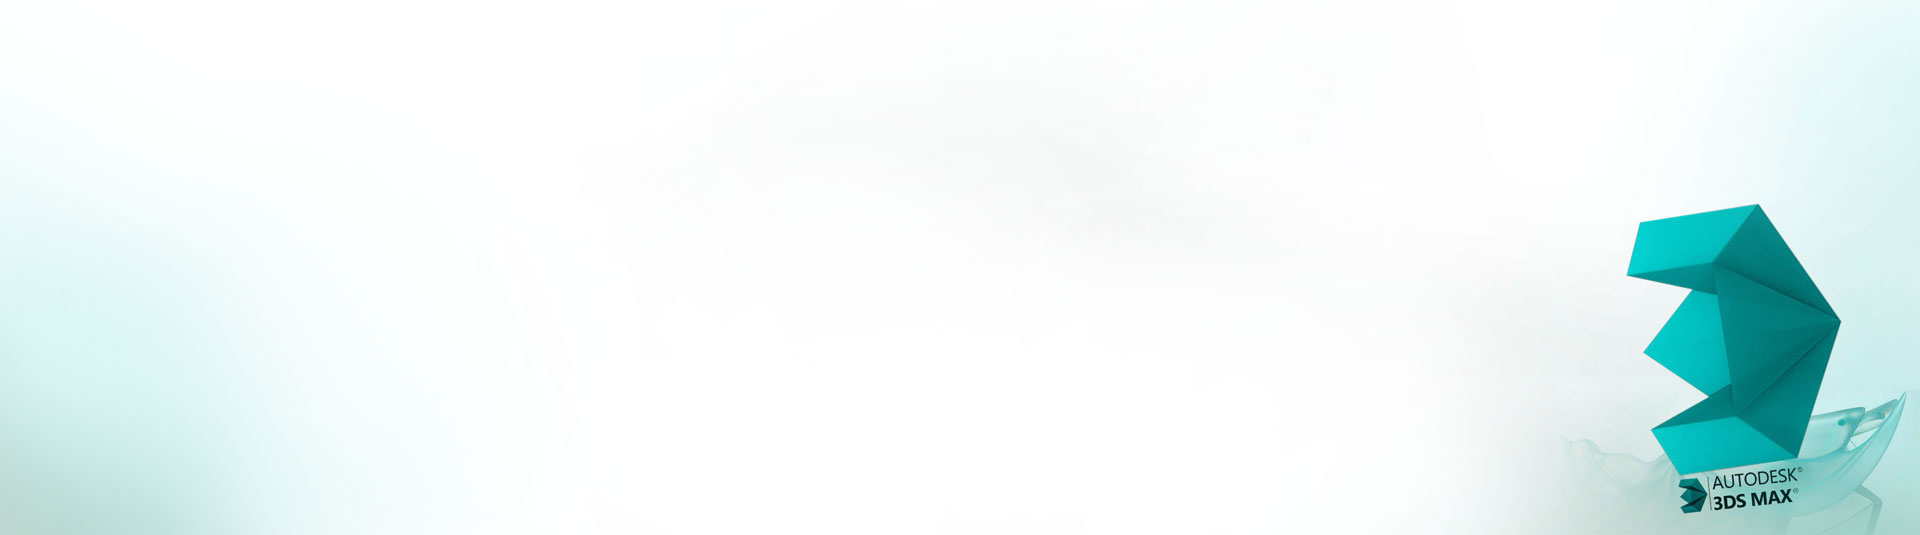 addres 3dmax background 11 - کلاس تری دی مکس ، دوره تری دی مکس ، آموزش 3dmax